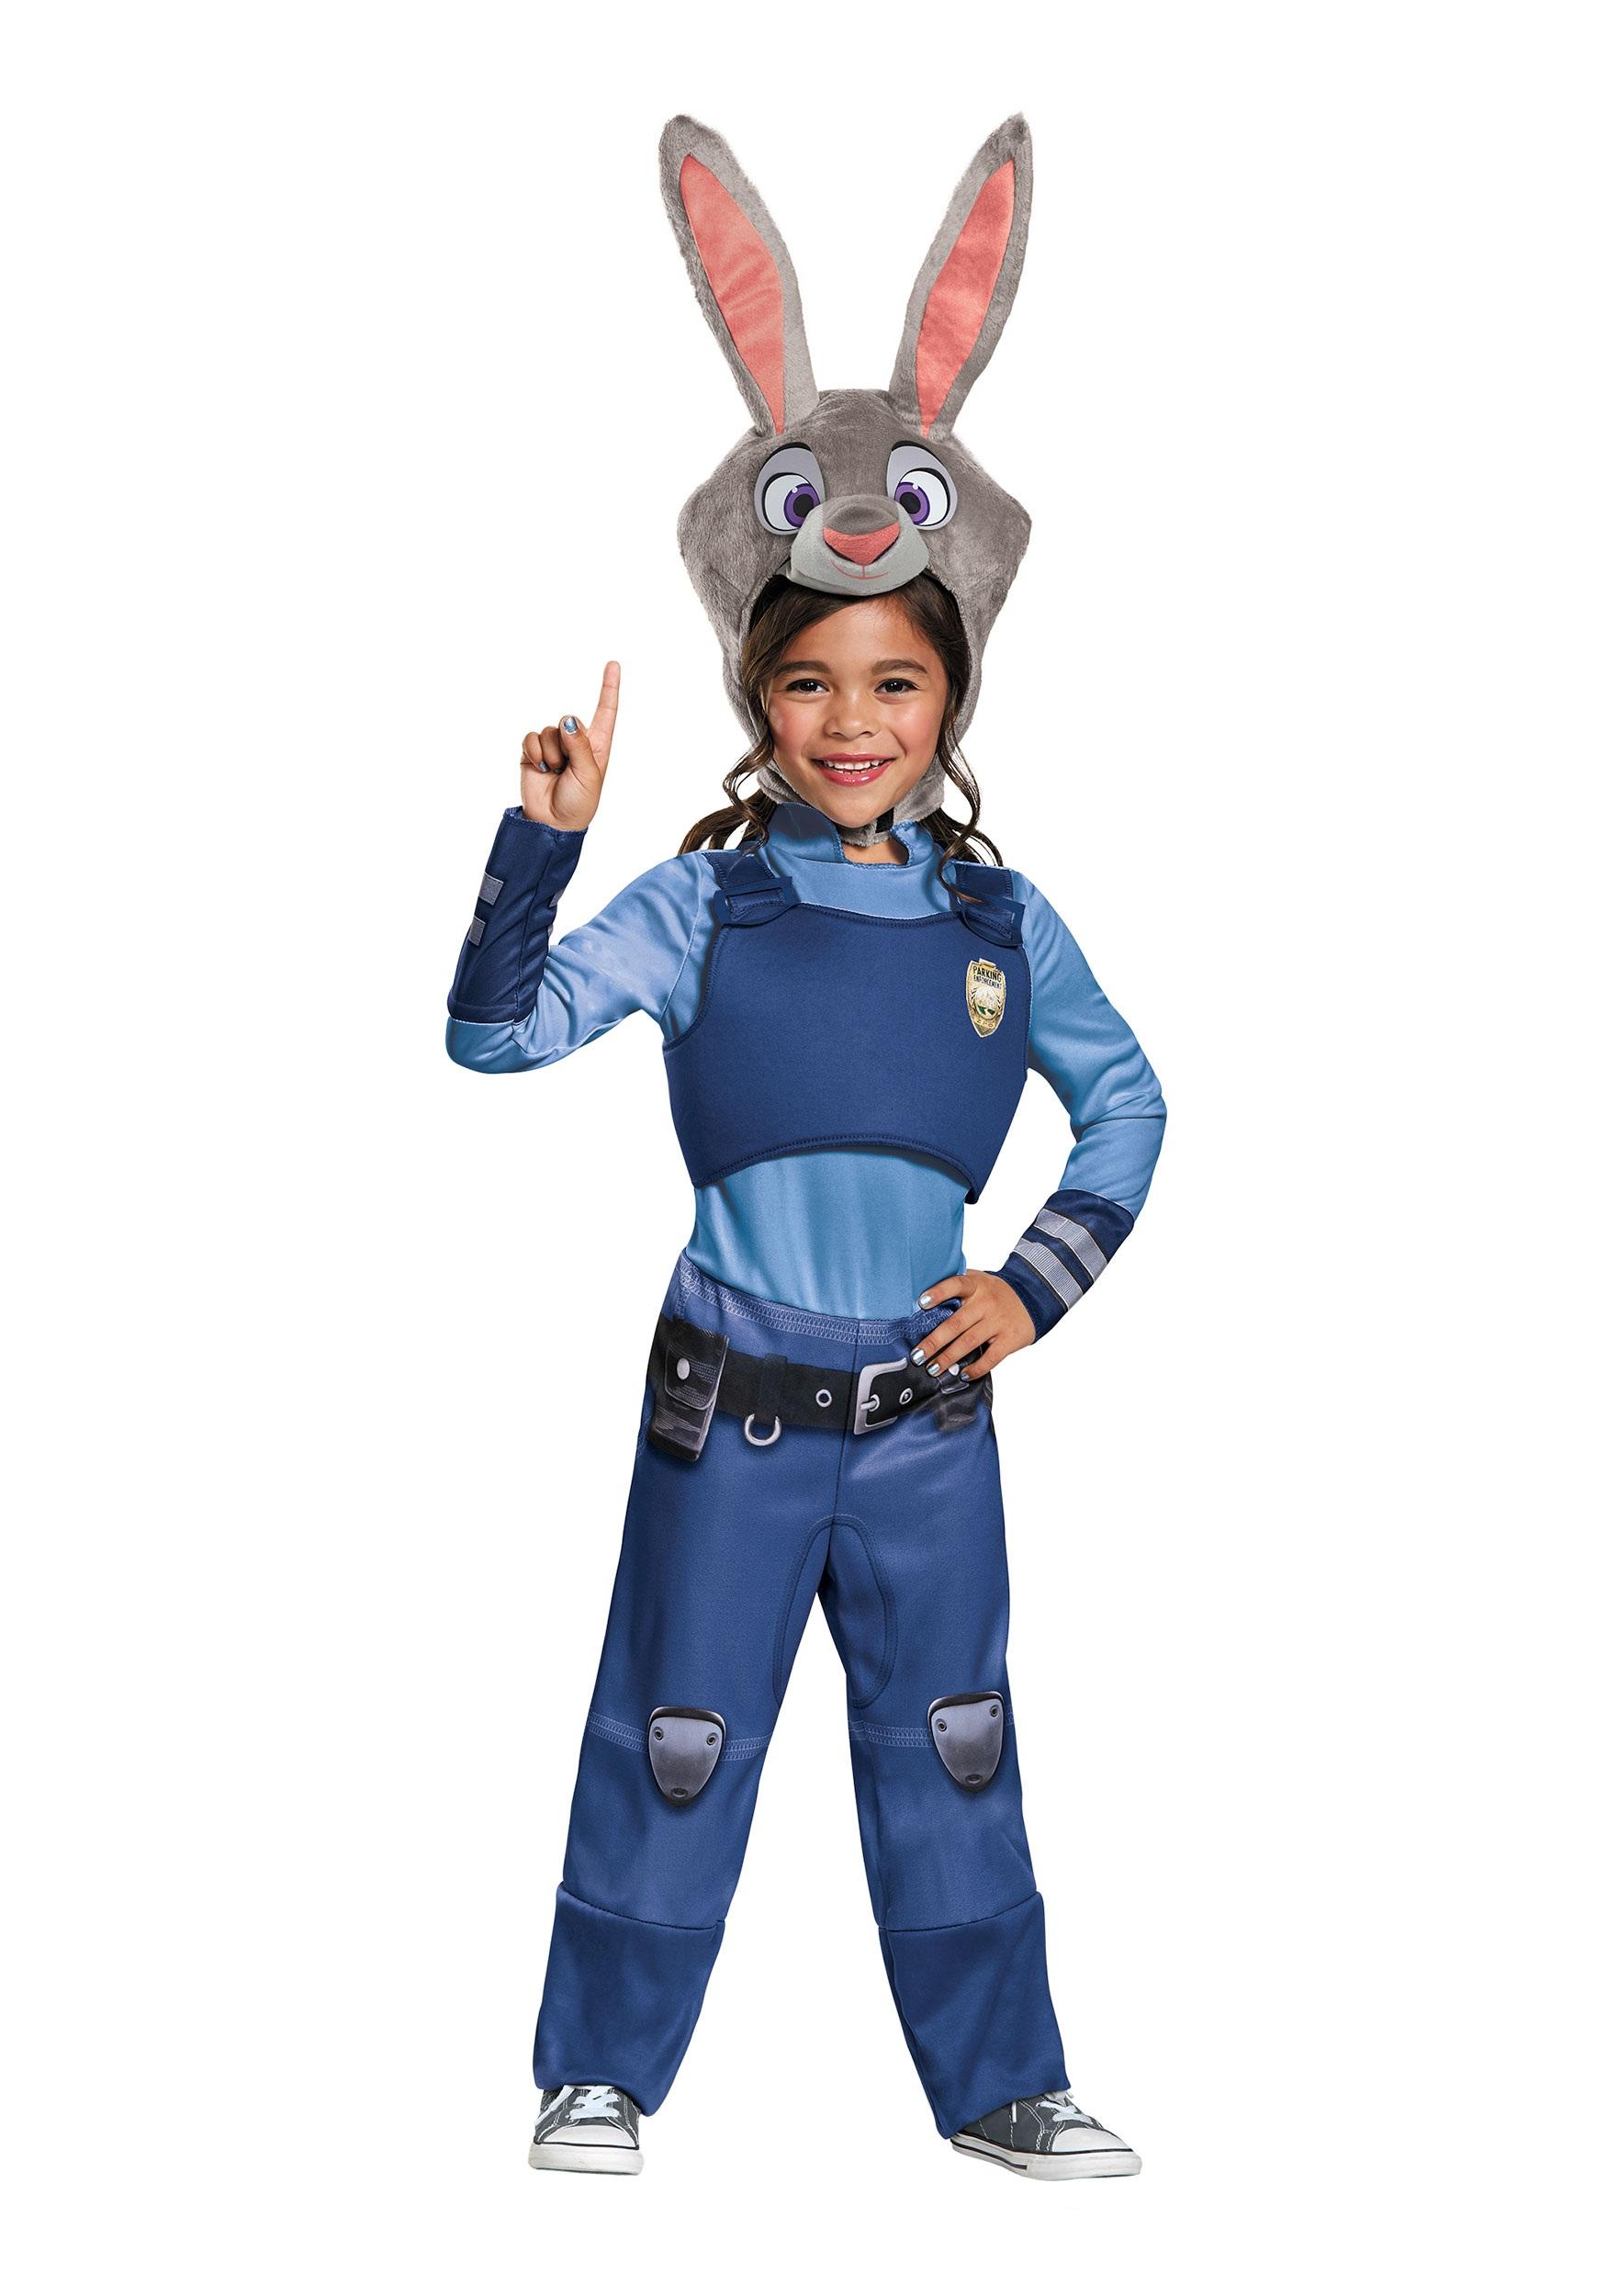 zootopia judy hopps costume for girls